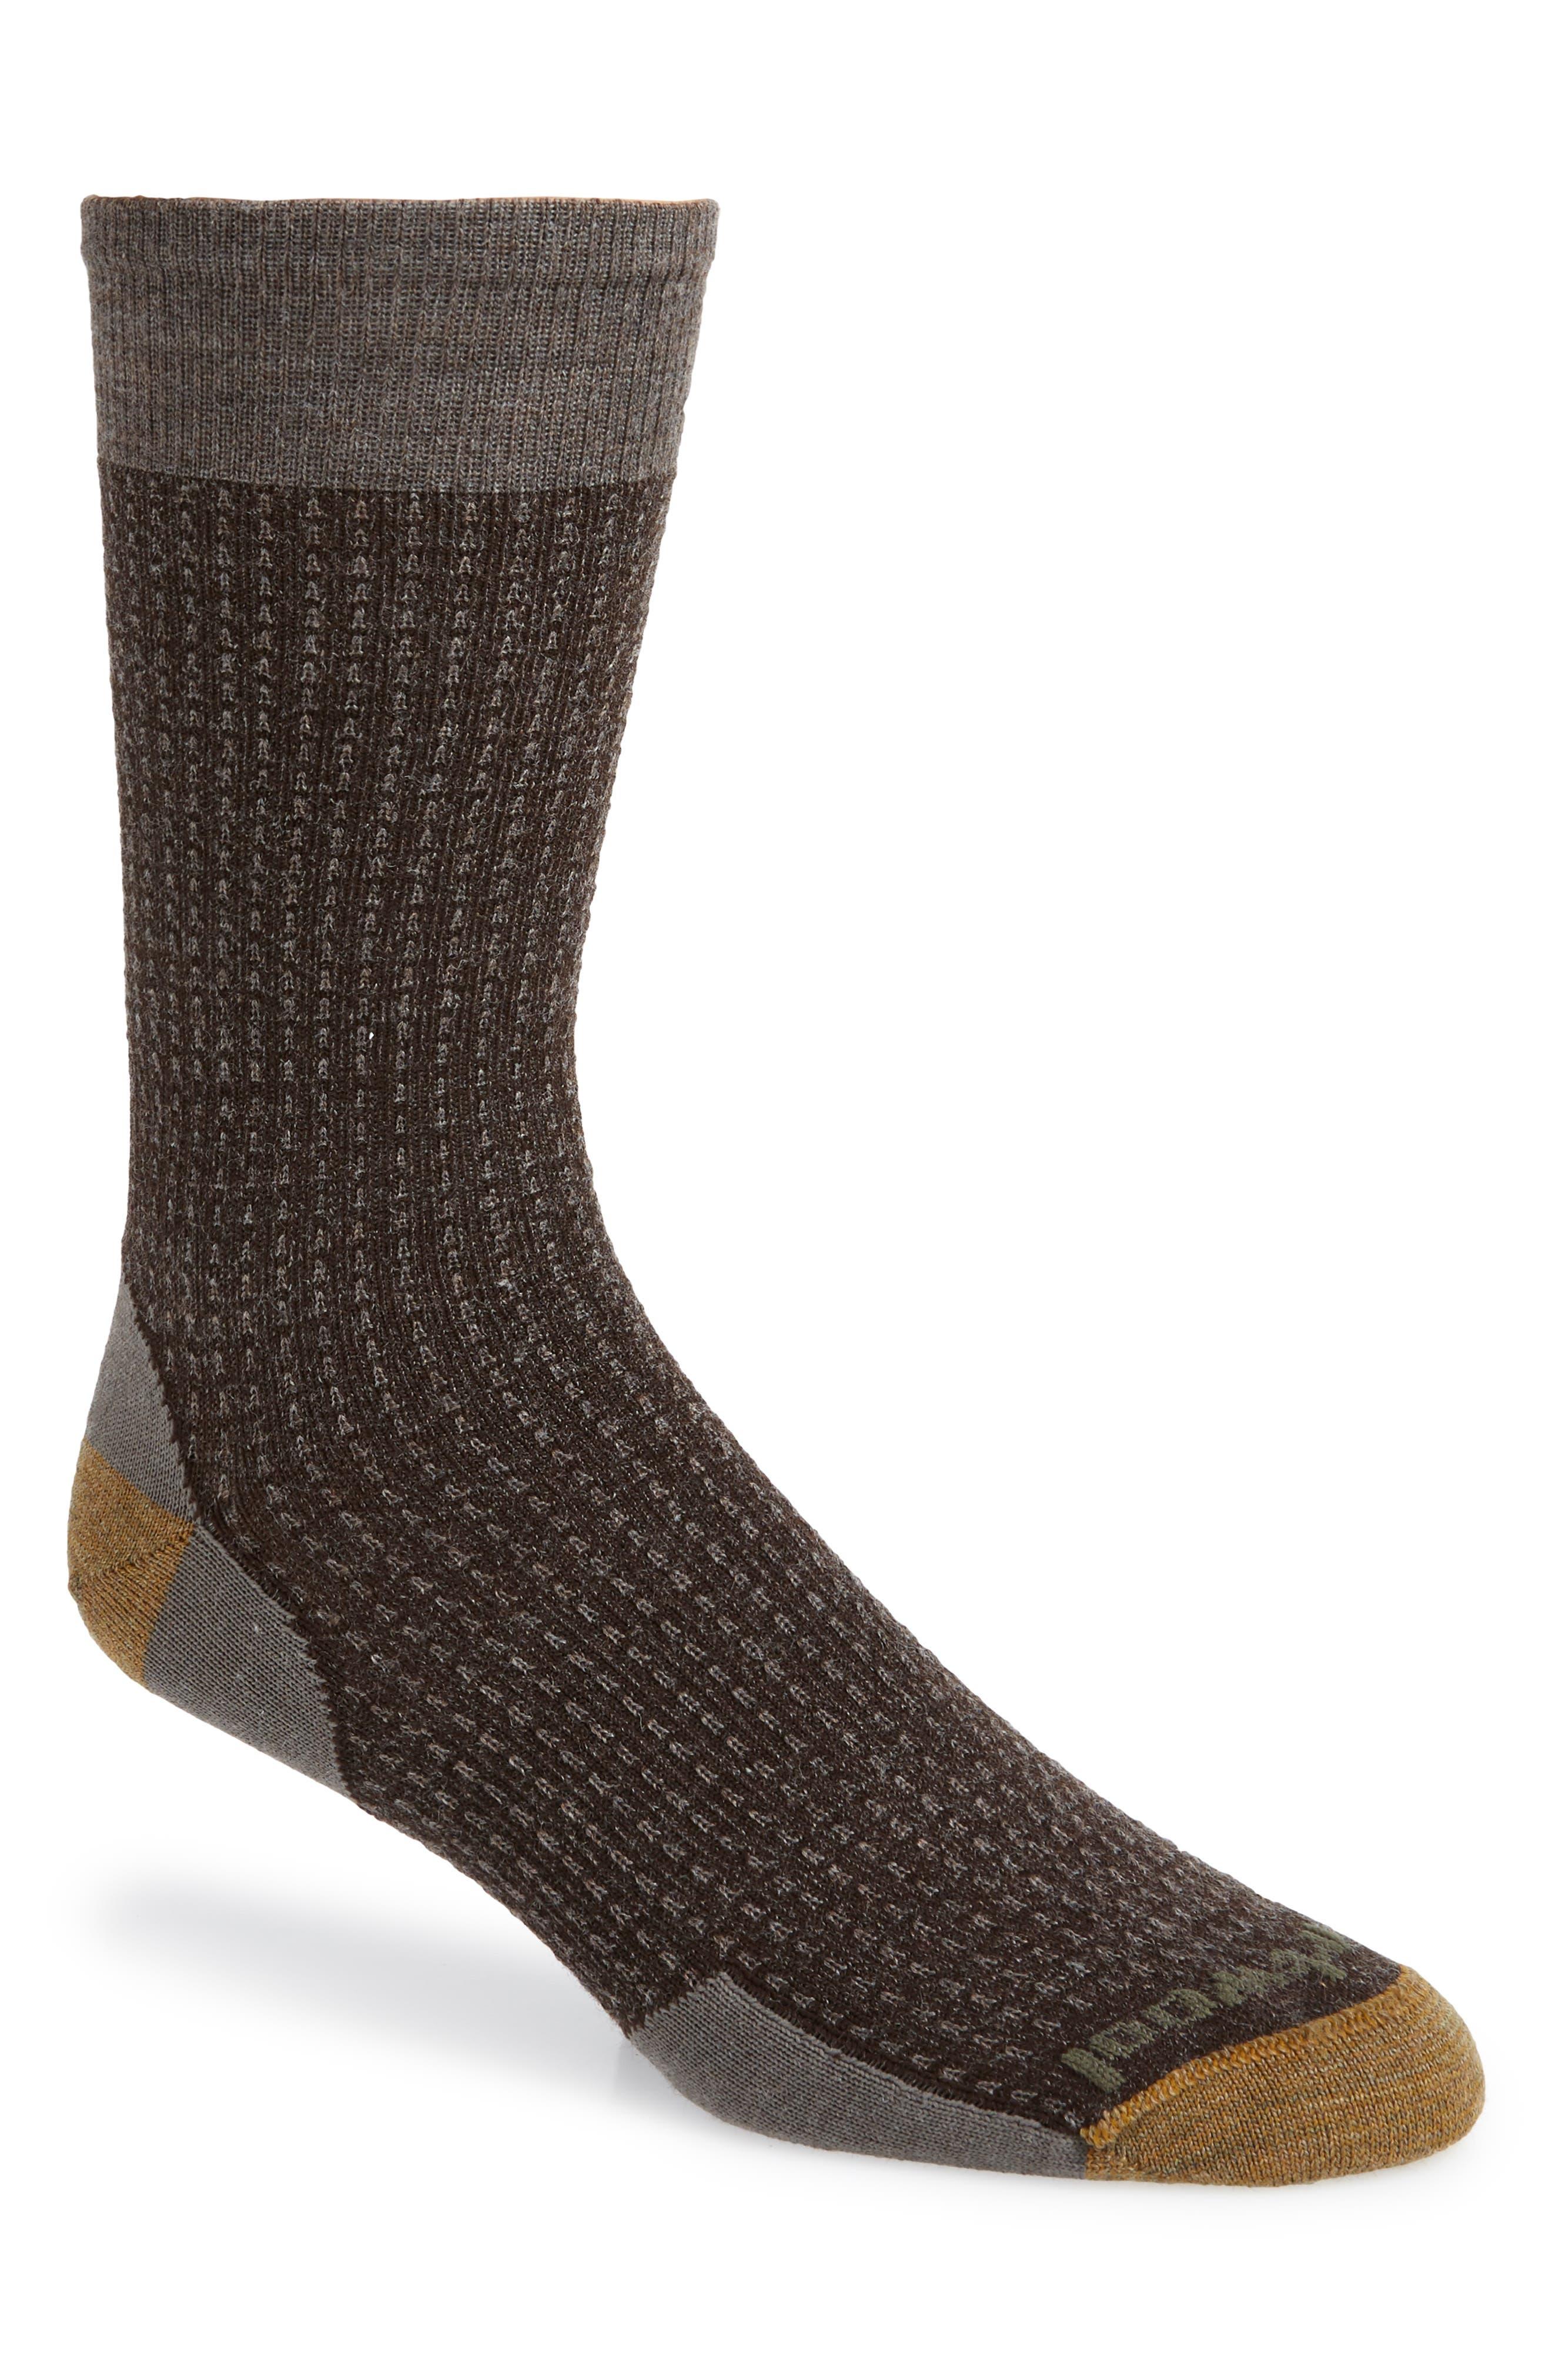 Premium East Gate Socks,                             Main thumbnail 1, color,                             TAUPE HEATHER